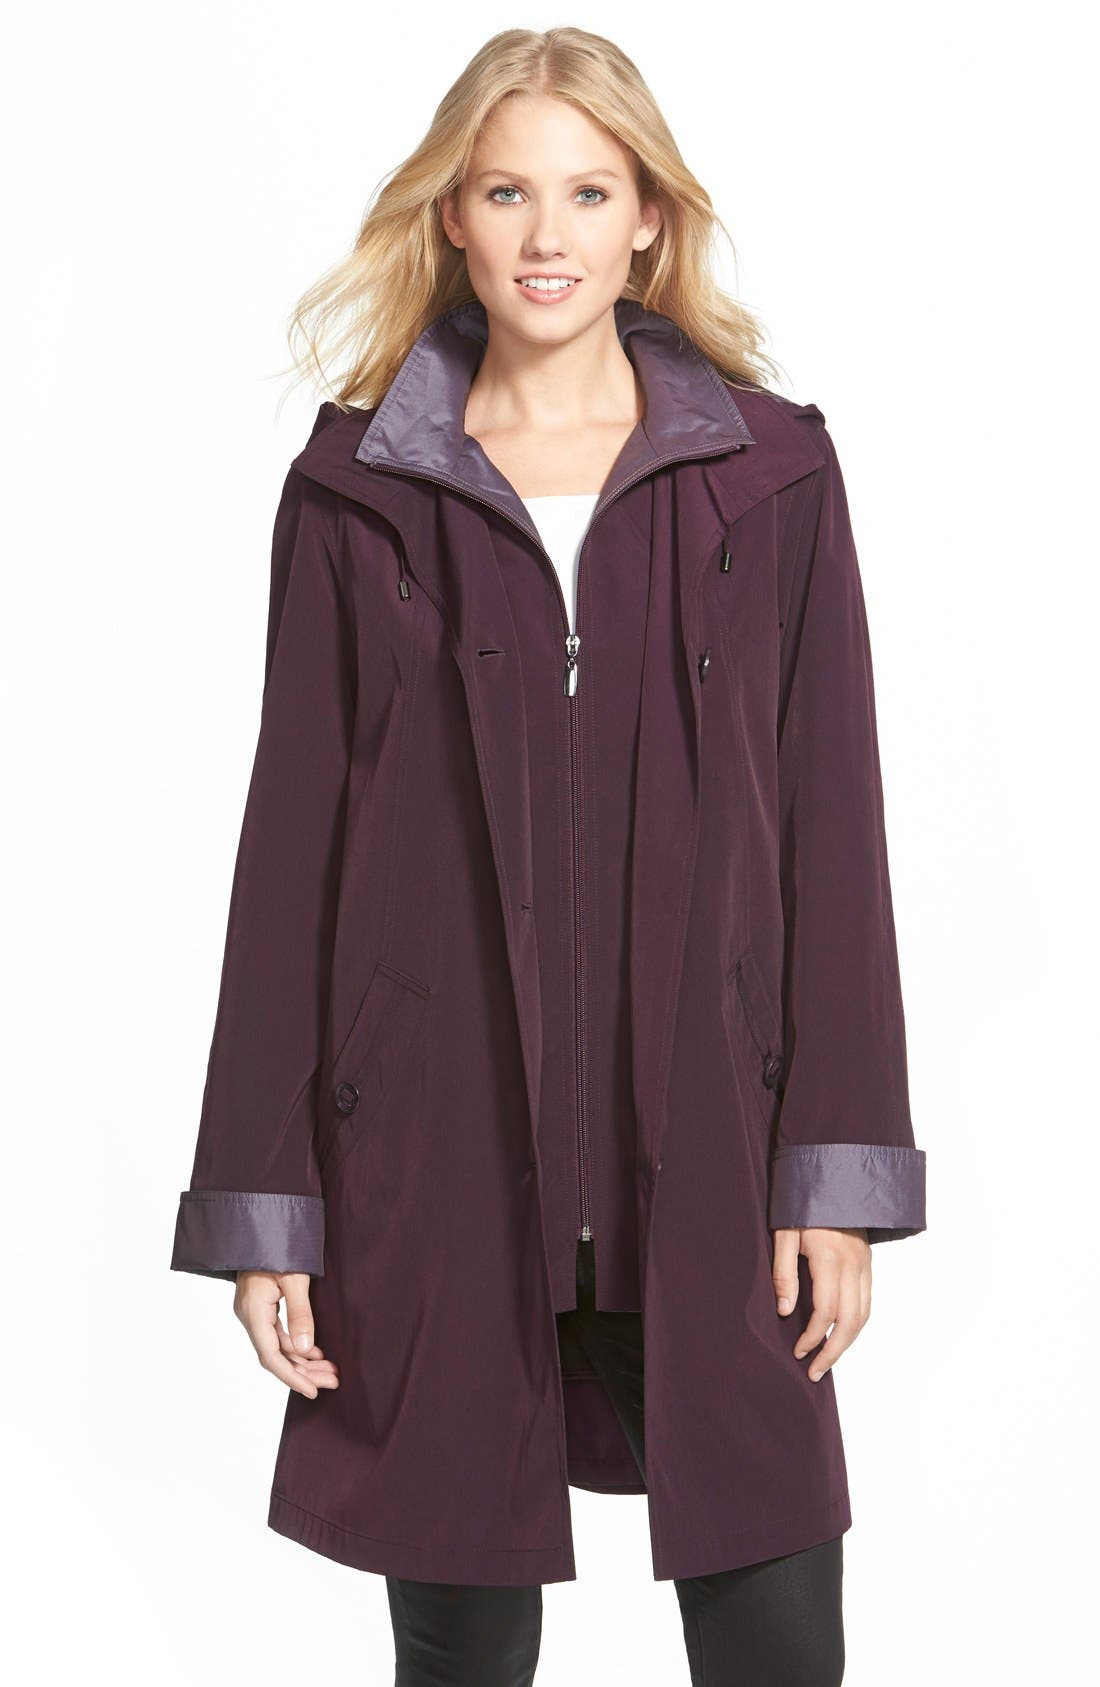 Two Tone Long Silk Look Raincoat,                             Main thumbnail 1, color,                             518